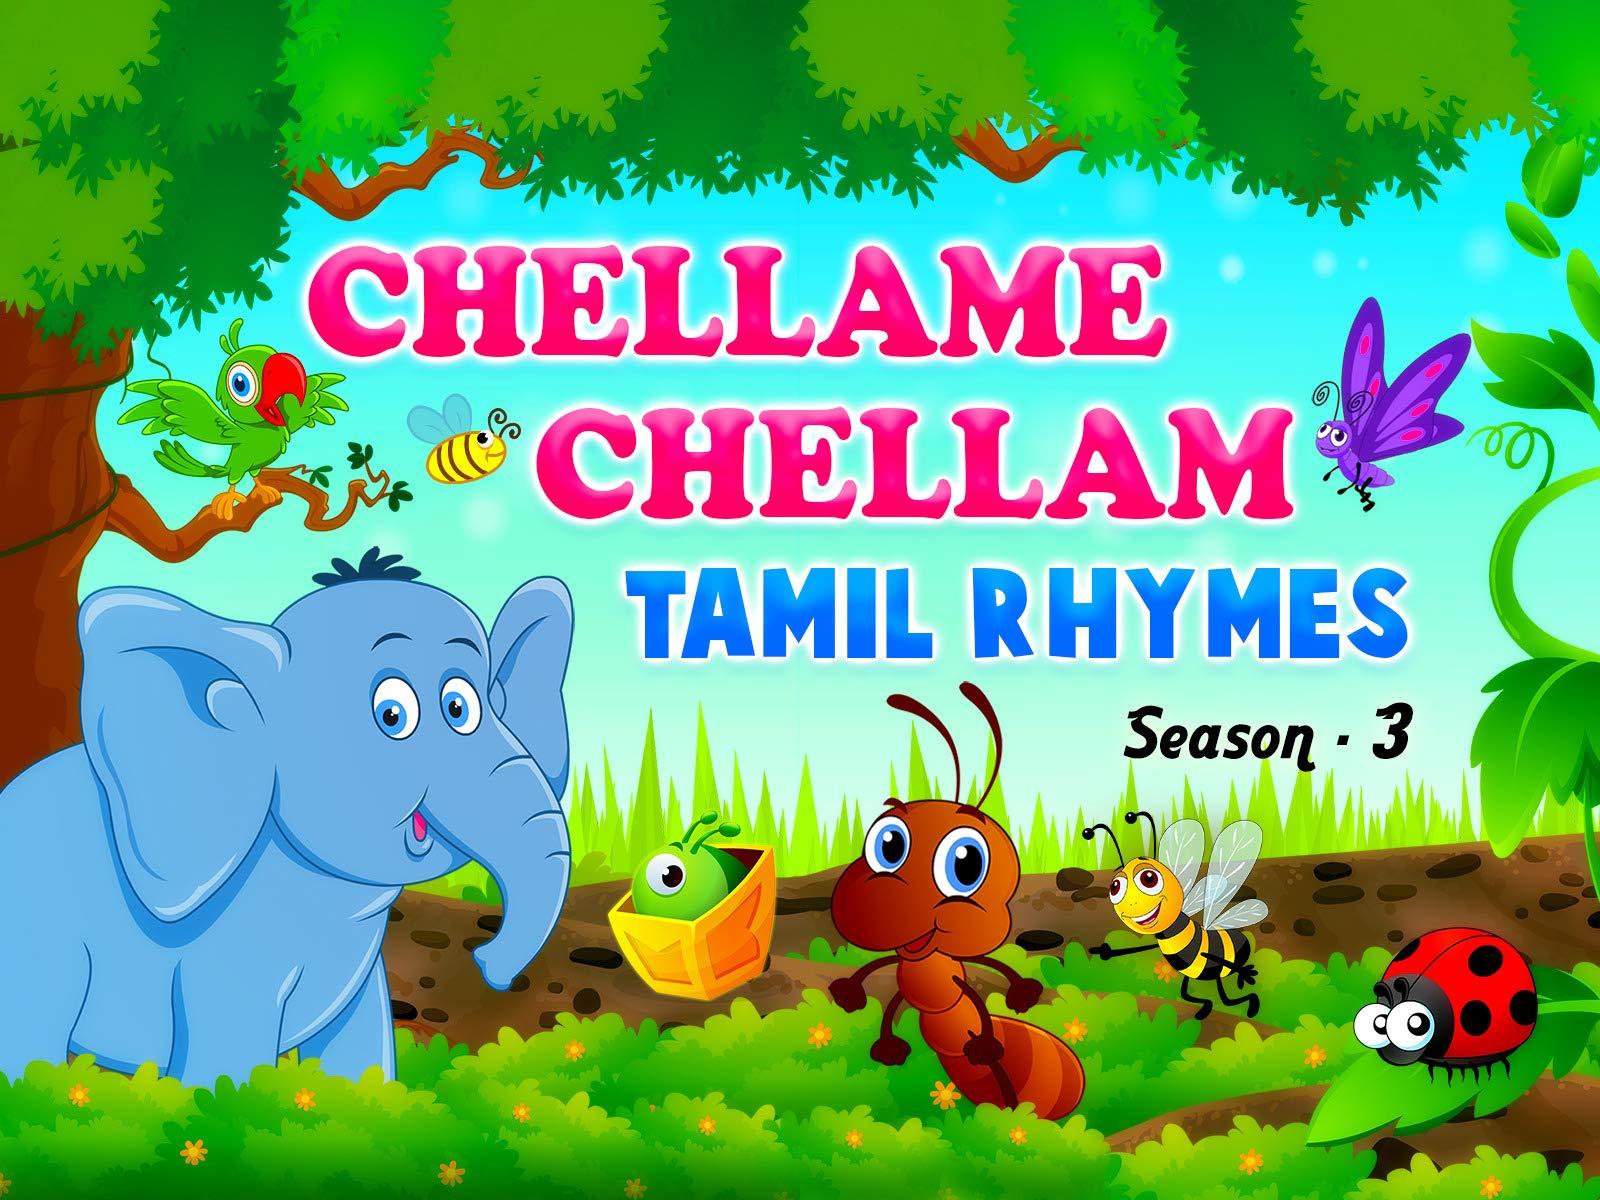 Chellame Chellam - Season 3